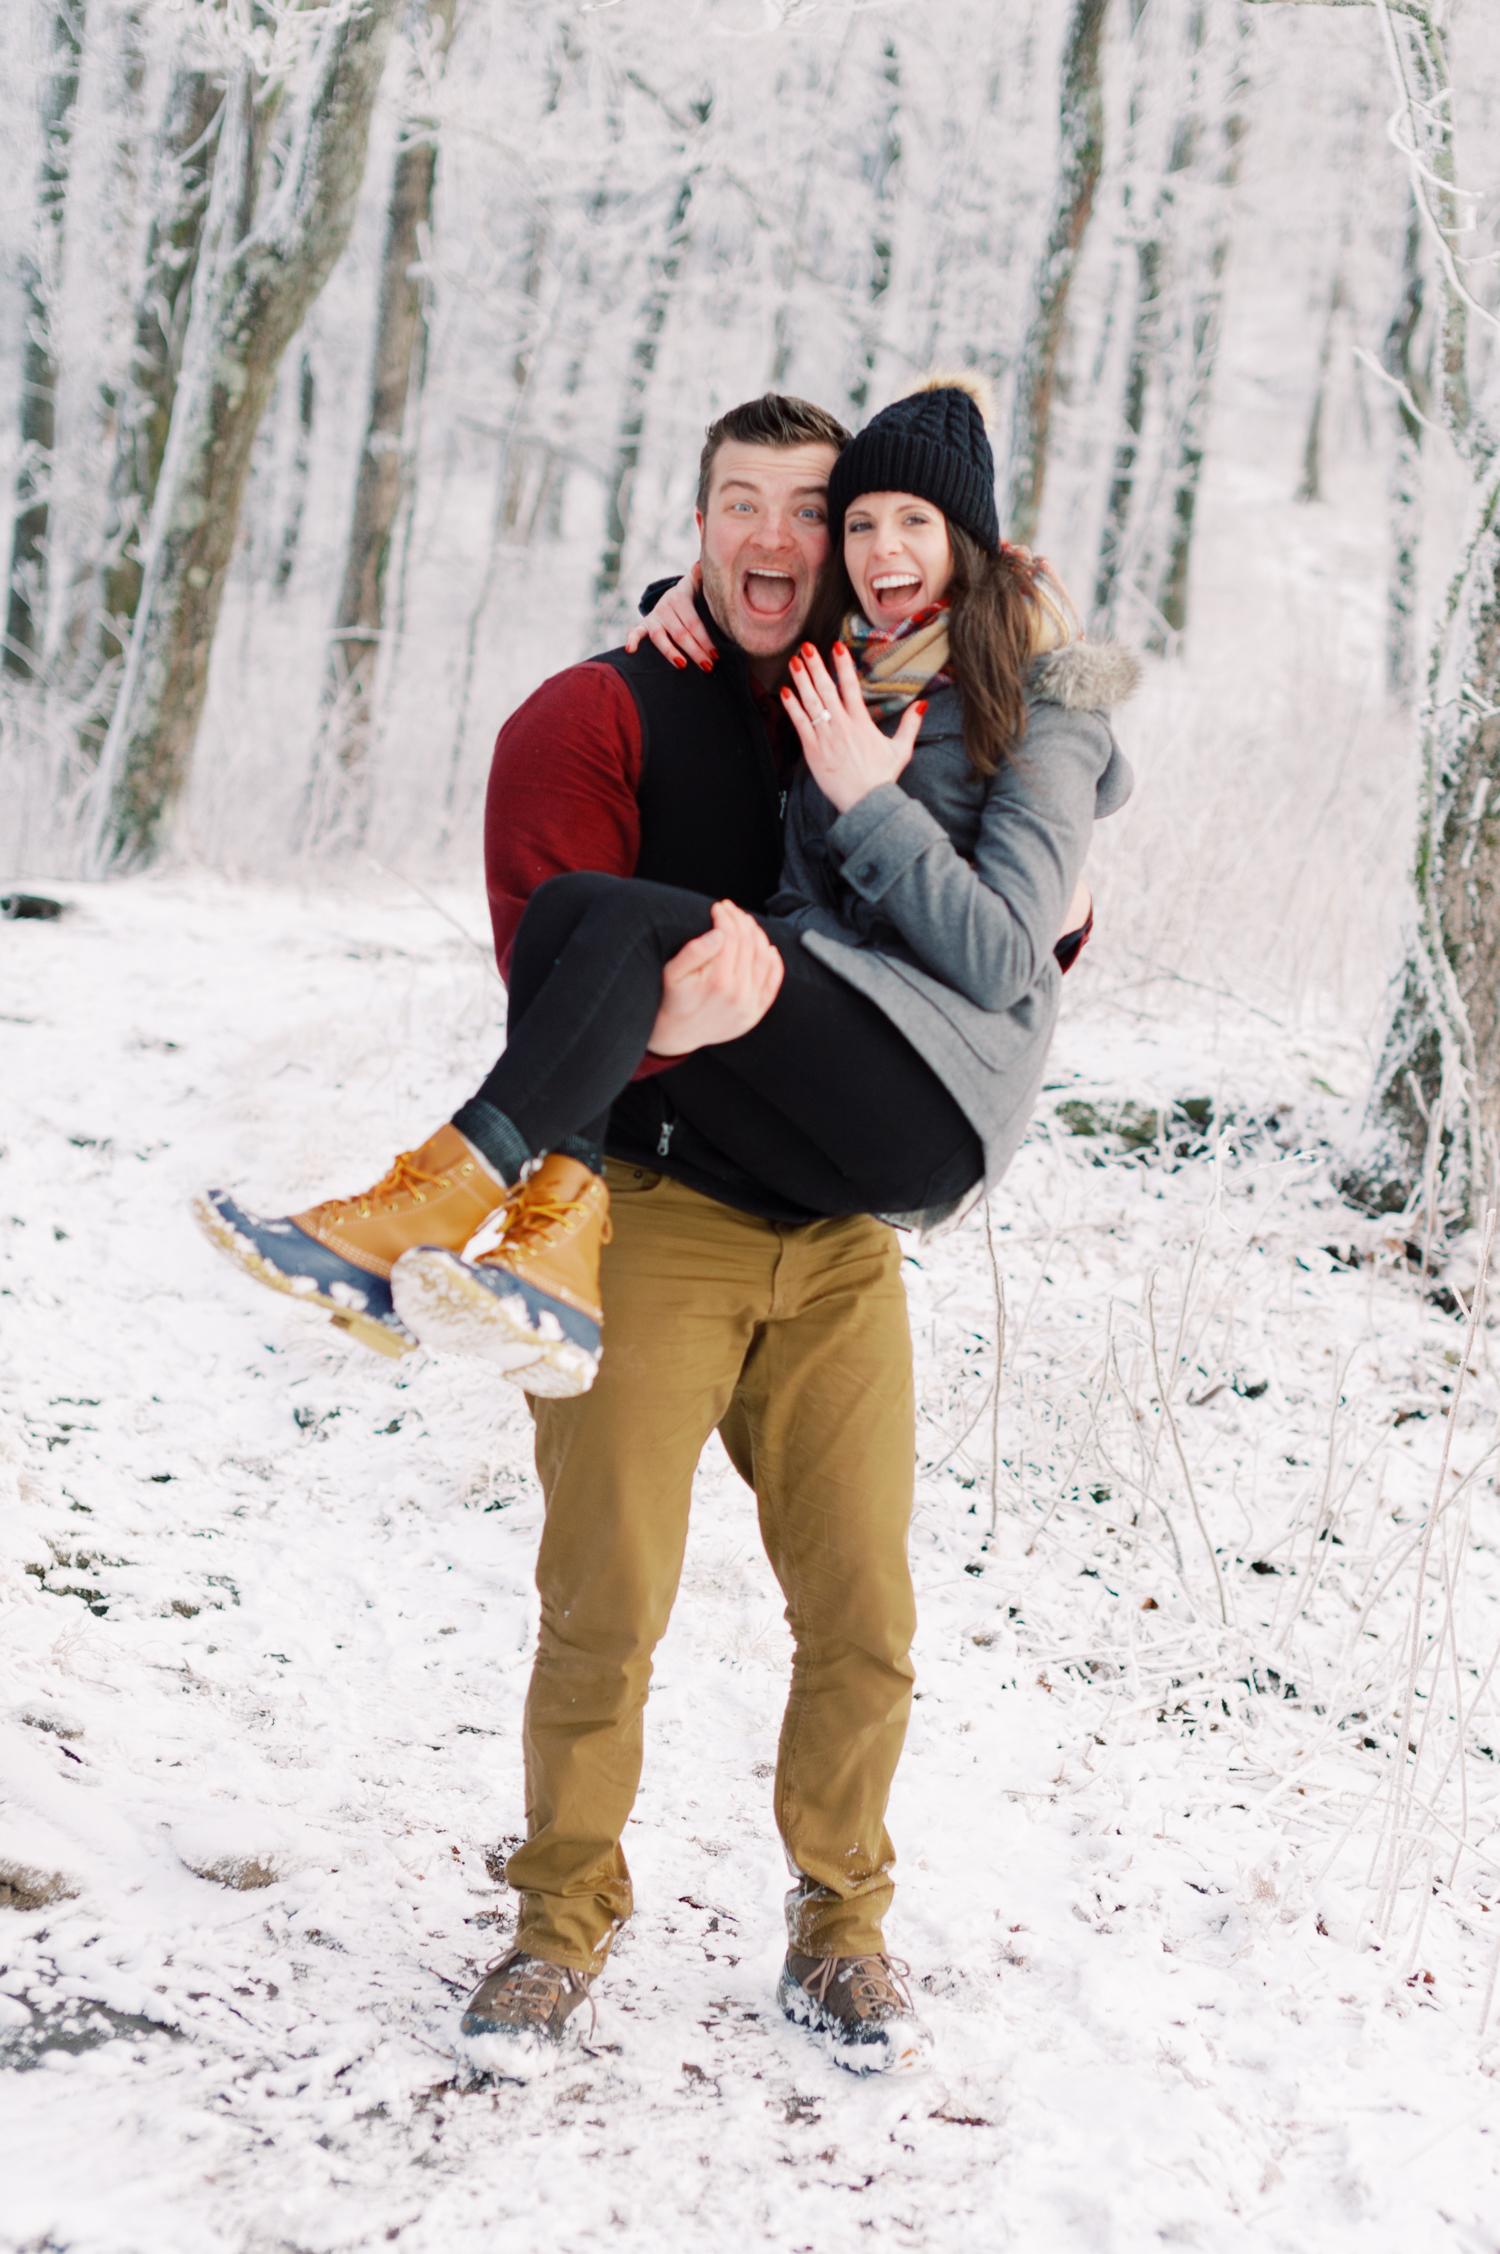 snowy-georgia-proposal-preachers-rock-atlanta-dahlonega-wedding-photographer-hannah-forsberg-fine-art-film-1.jpg